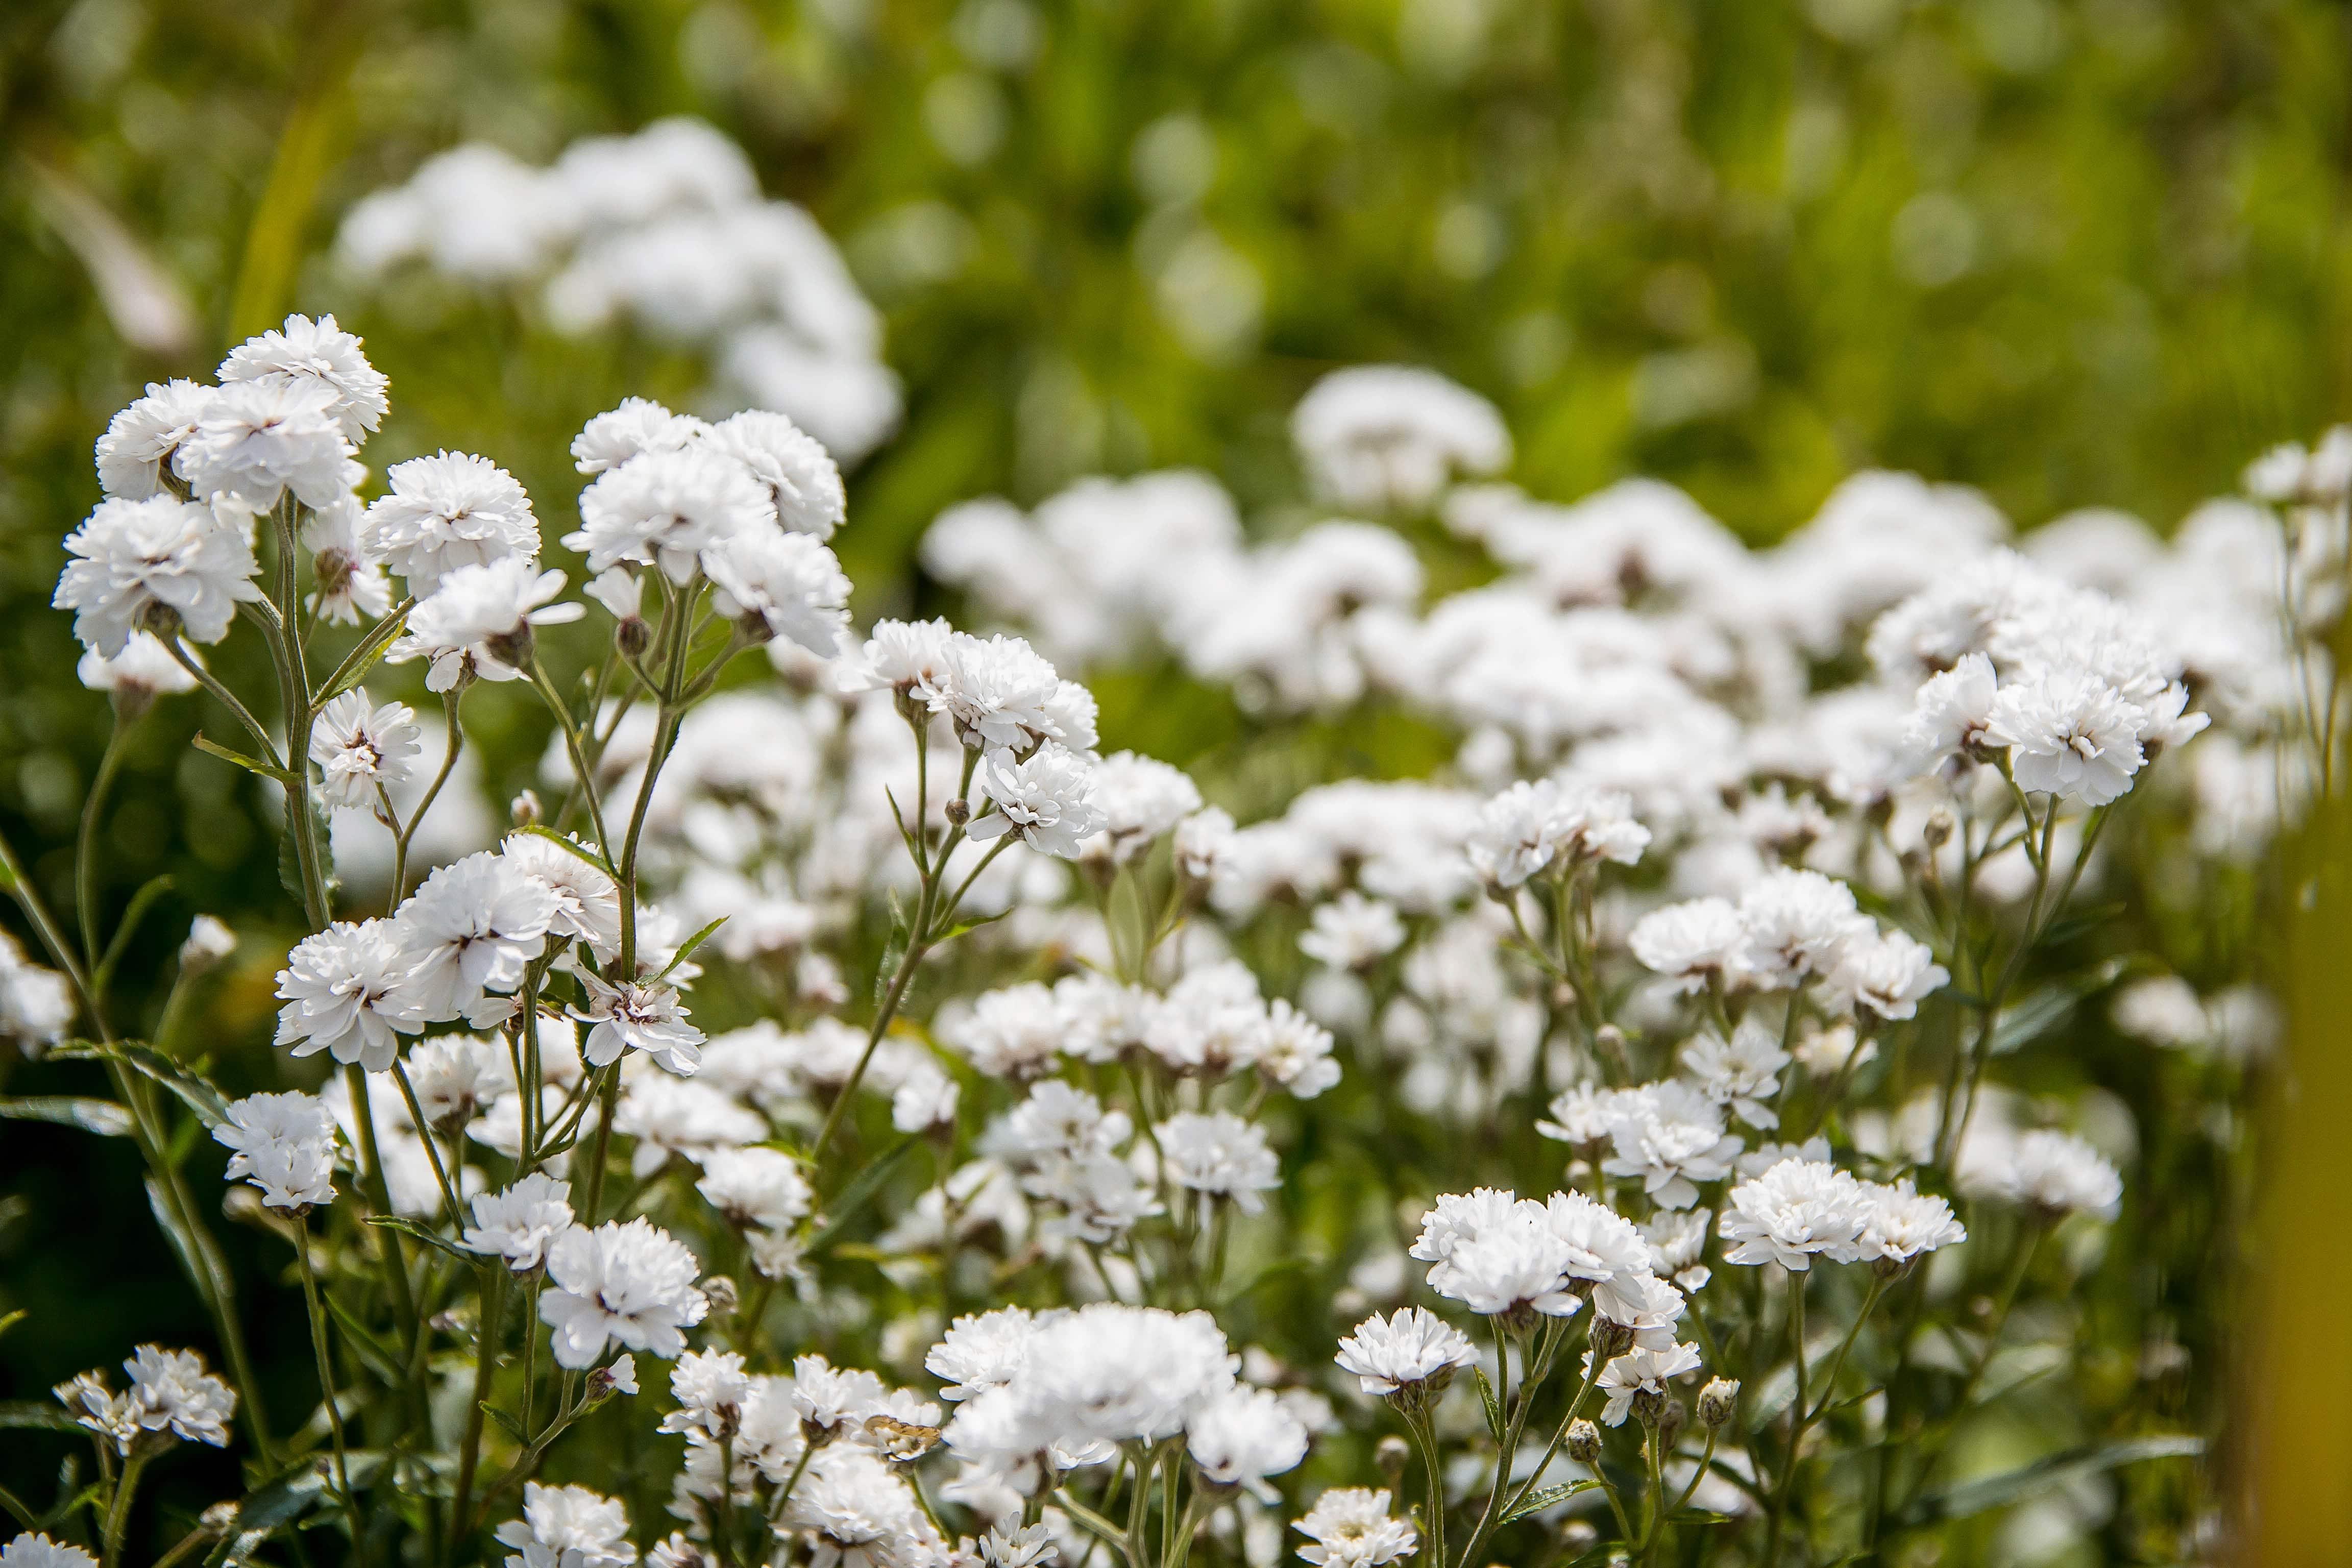 White flowers baby's breath Bush